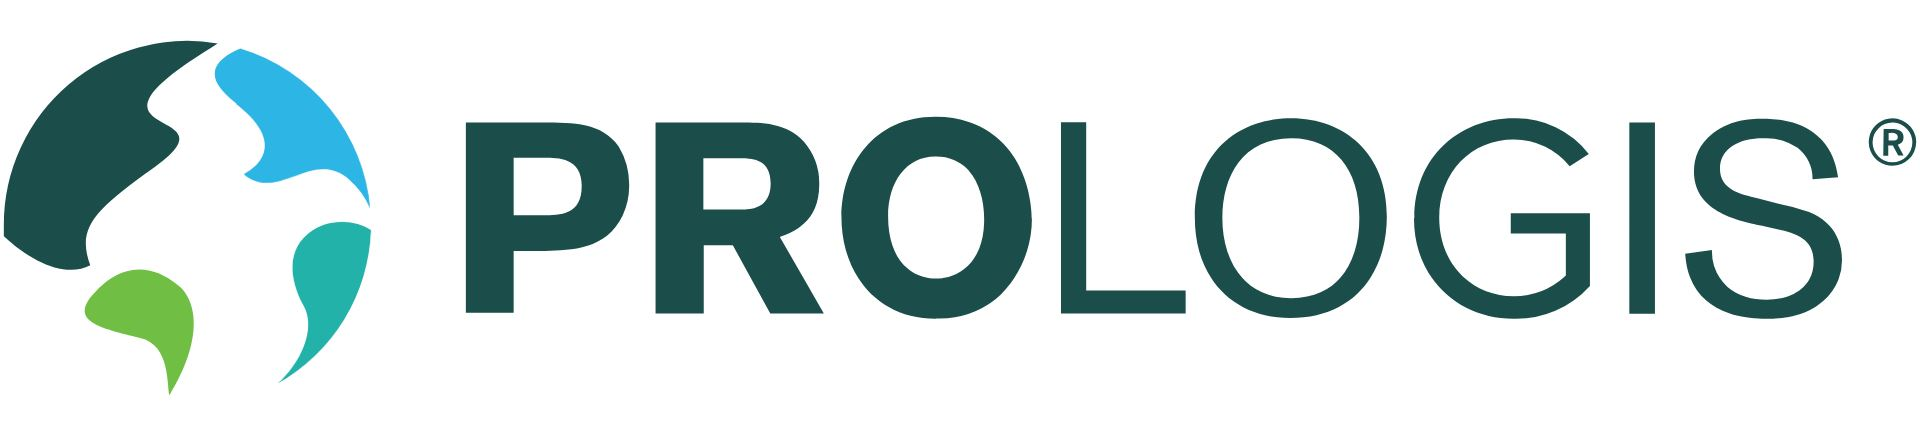 Prologis, Inc. Company Logo